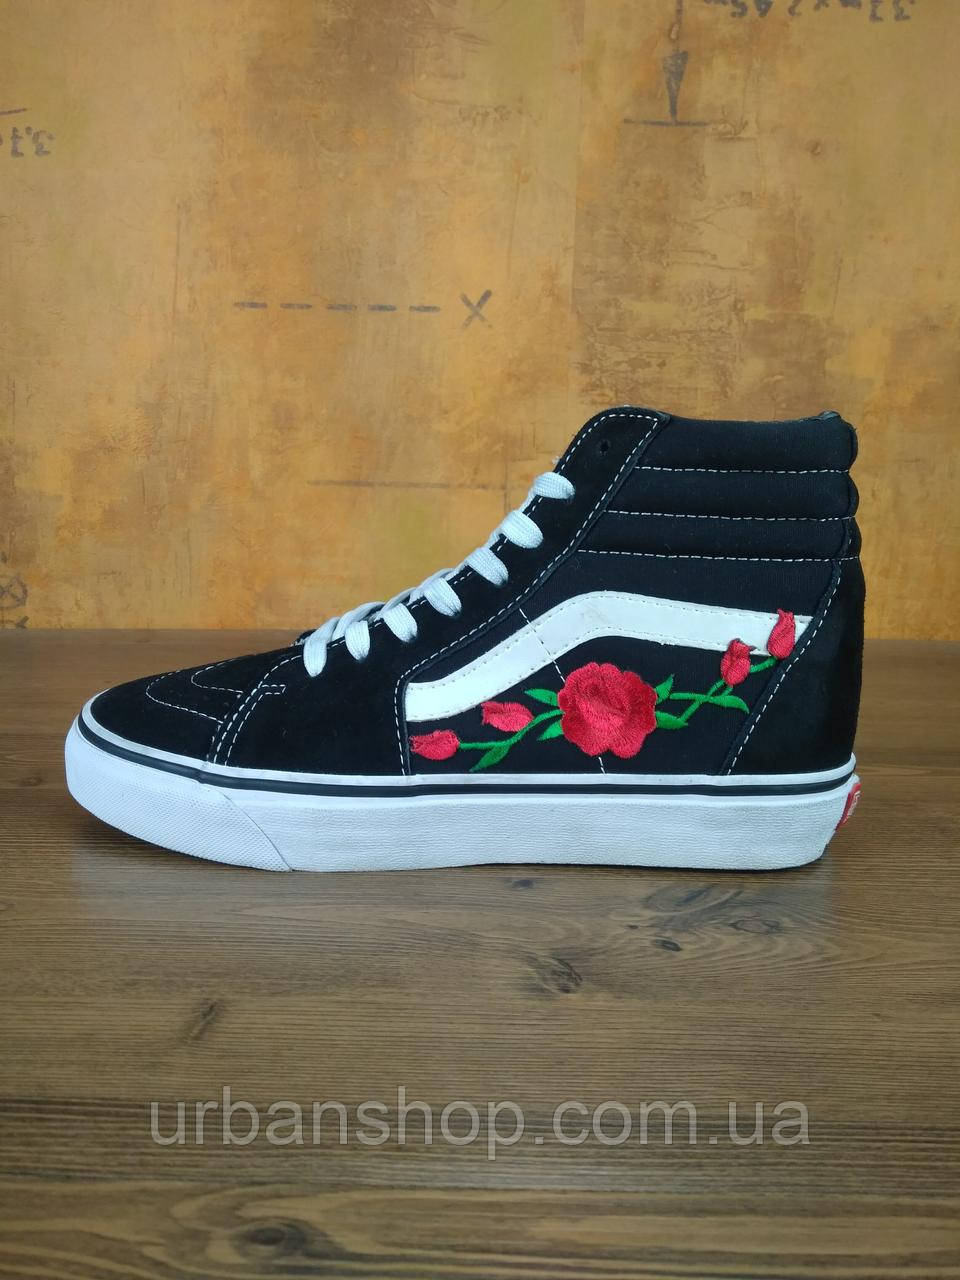 Кеди Vans SK8-HI Roses Black/White